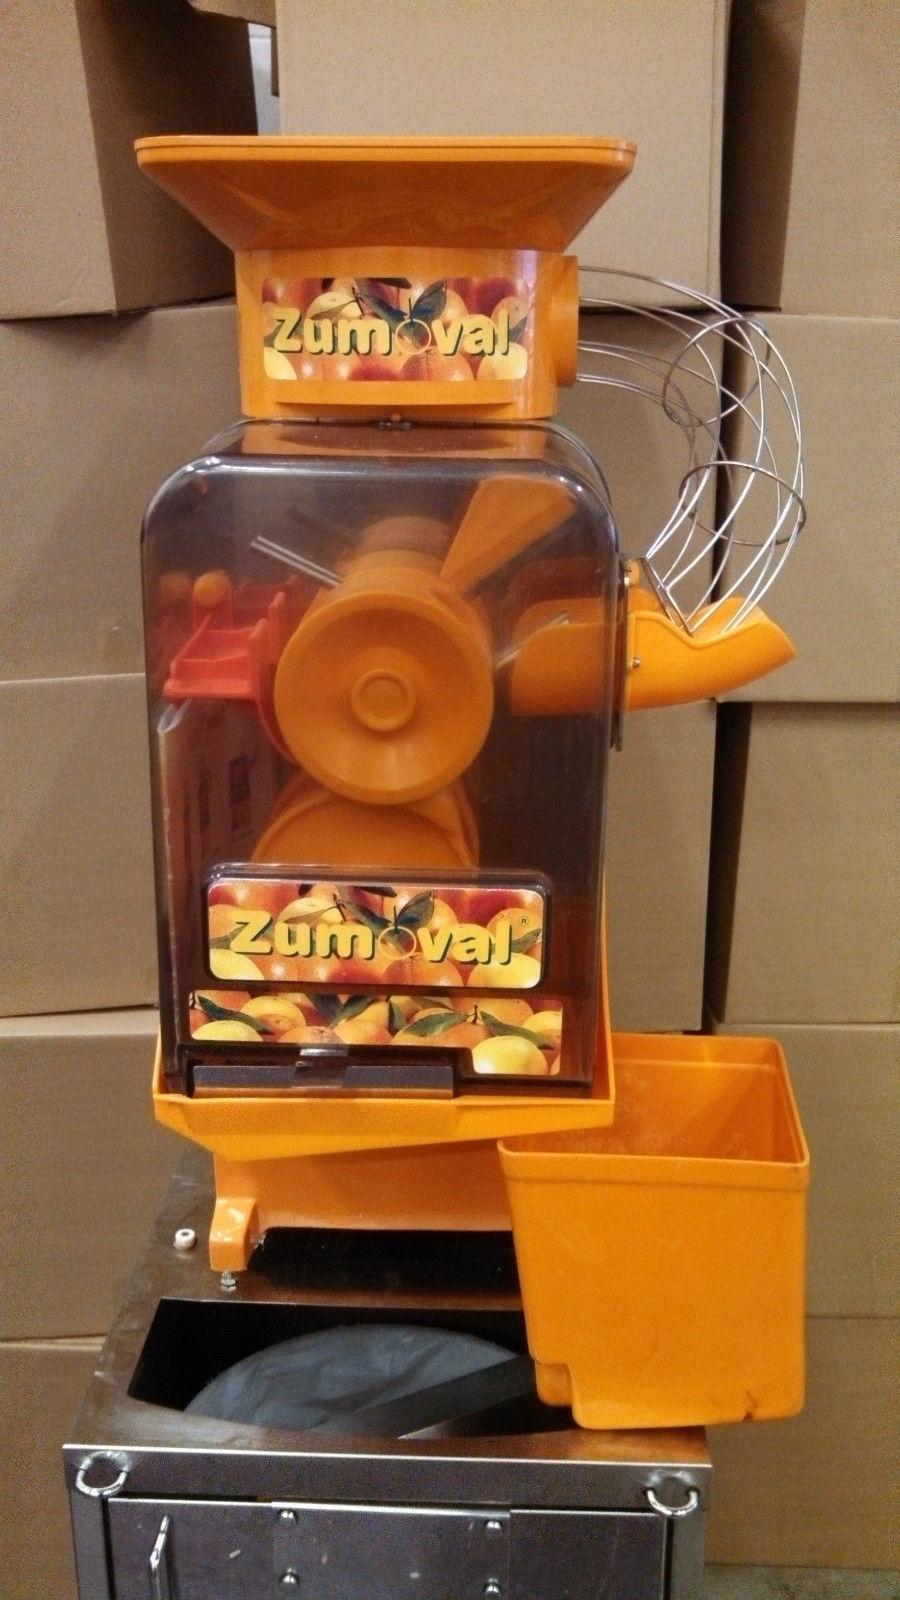 Zumoval Minimatic Citrus Juicer